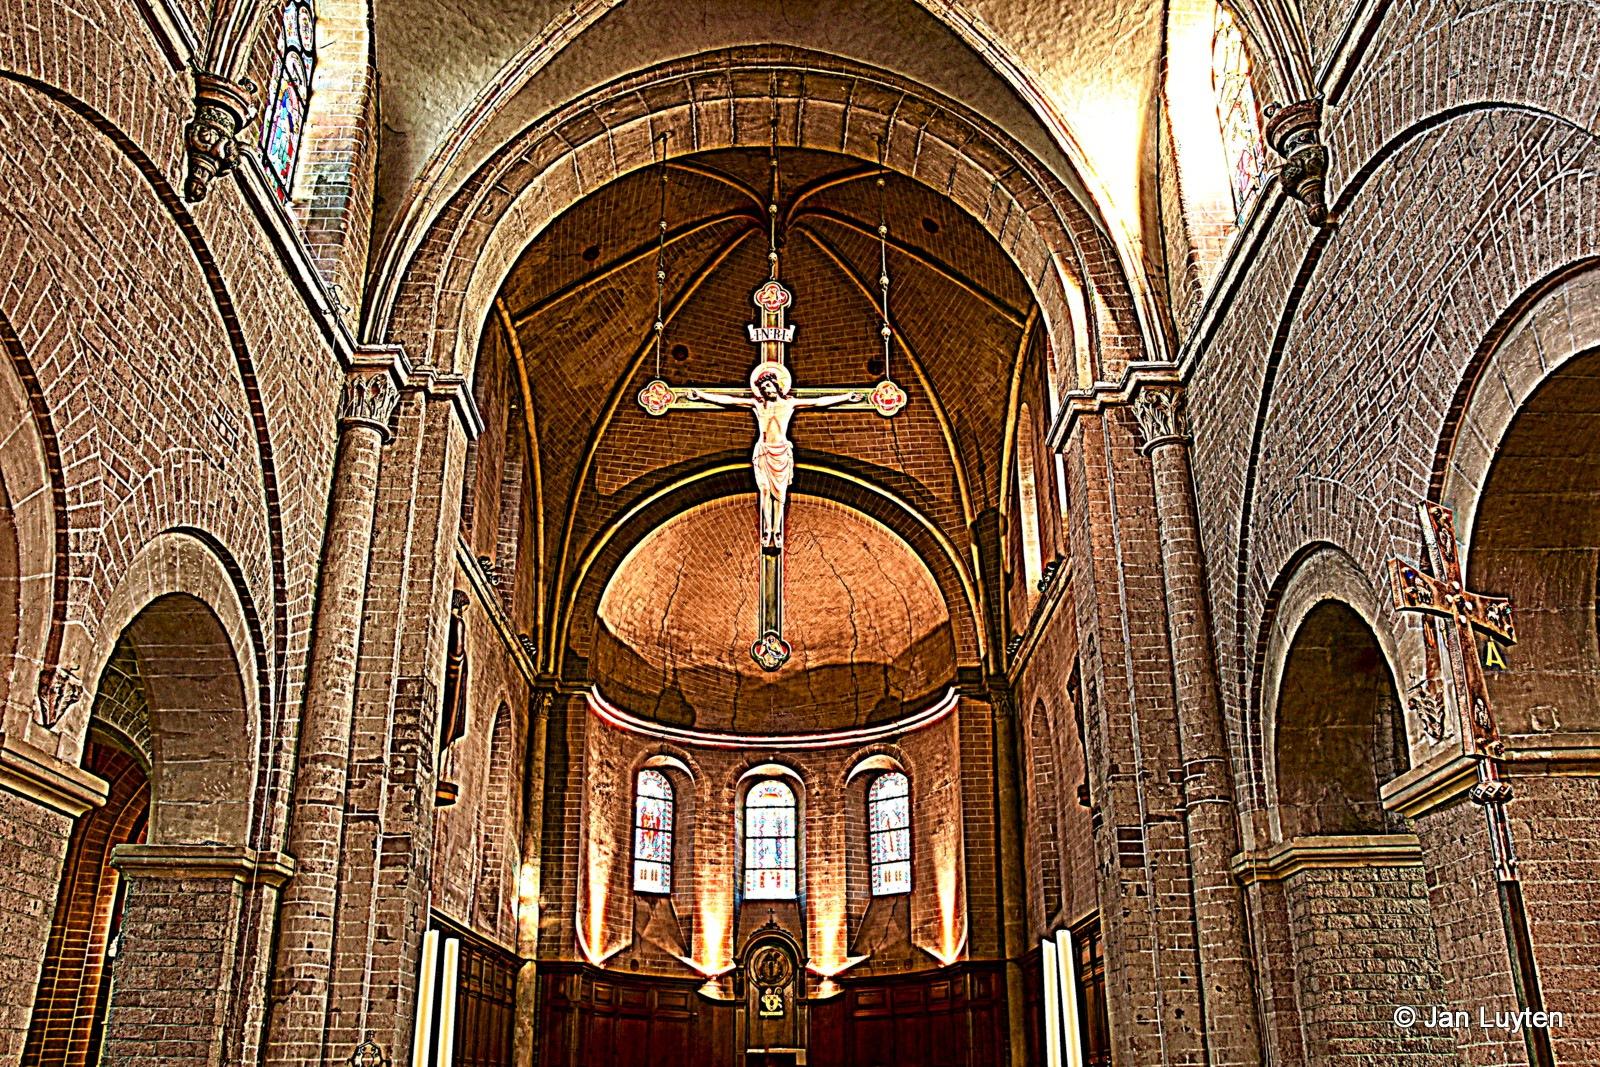 Kerk Postel by Jan Luyten